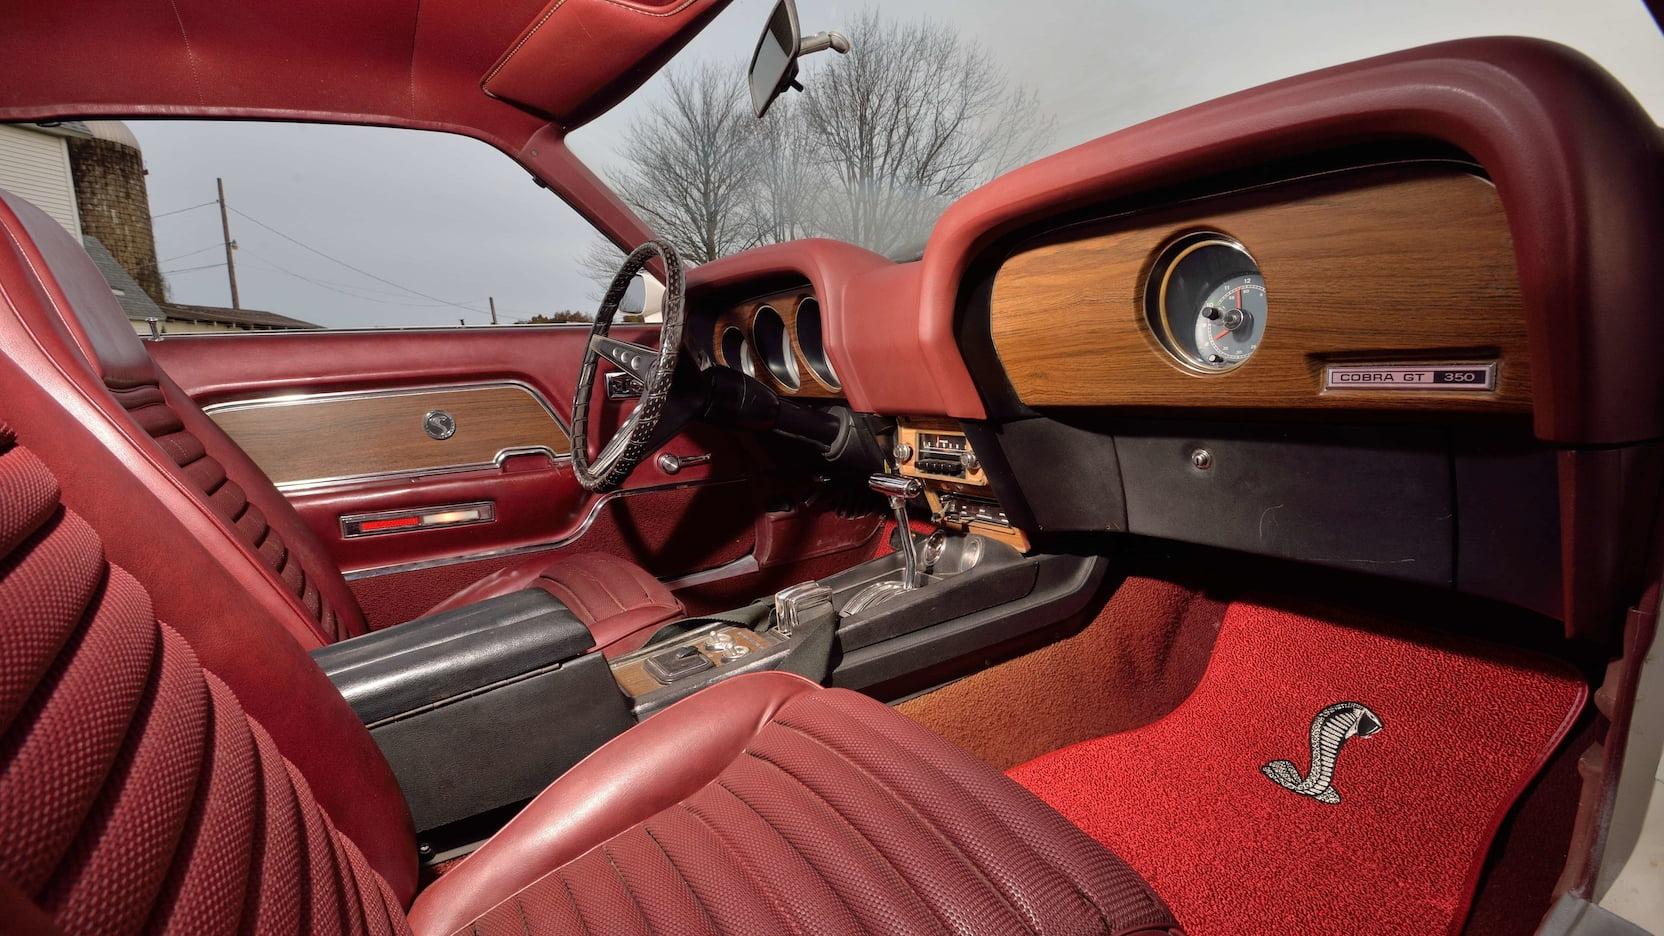 1970 Shelby GT350 interior passenger